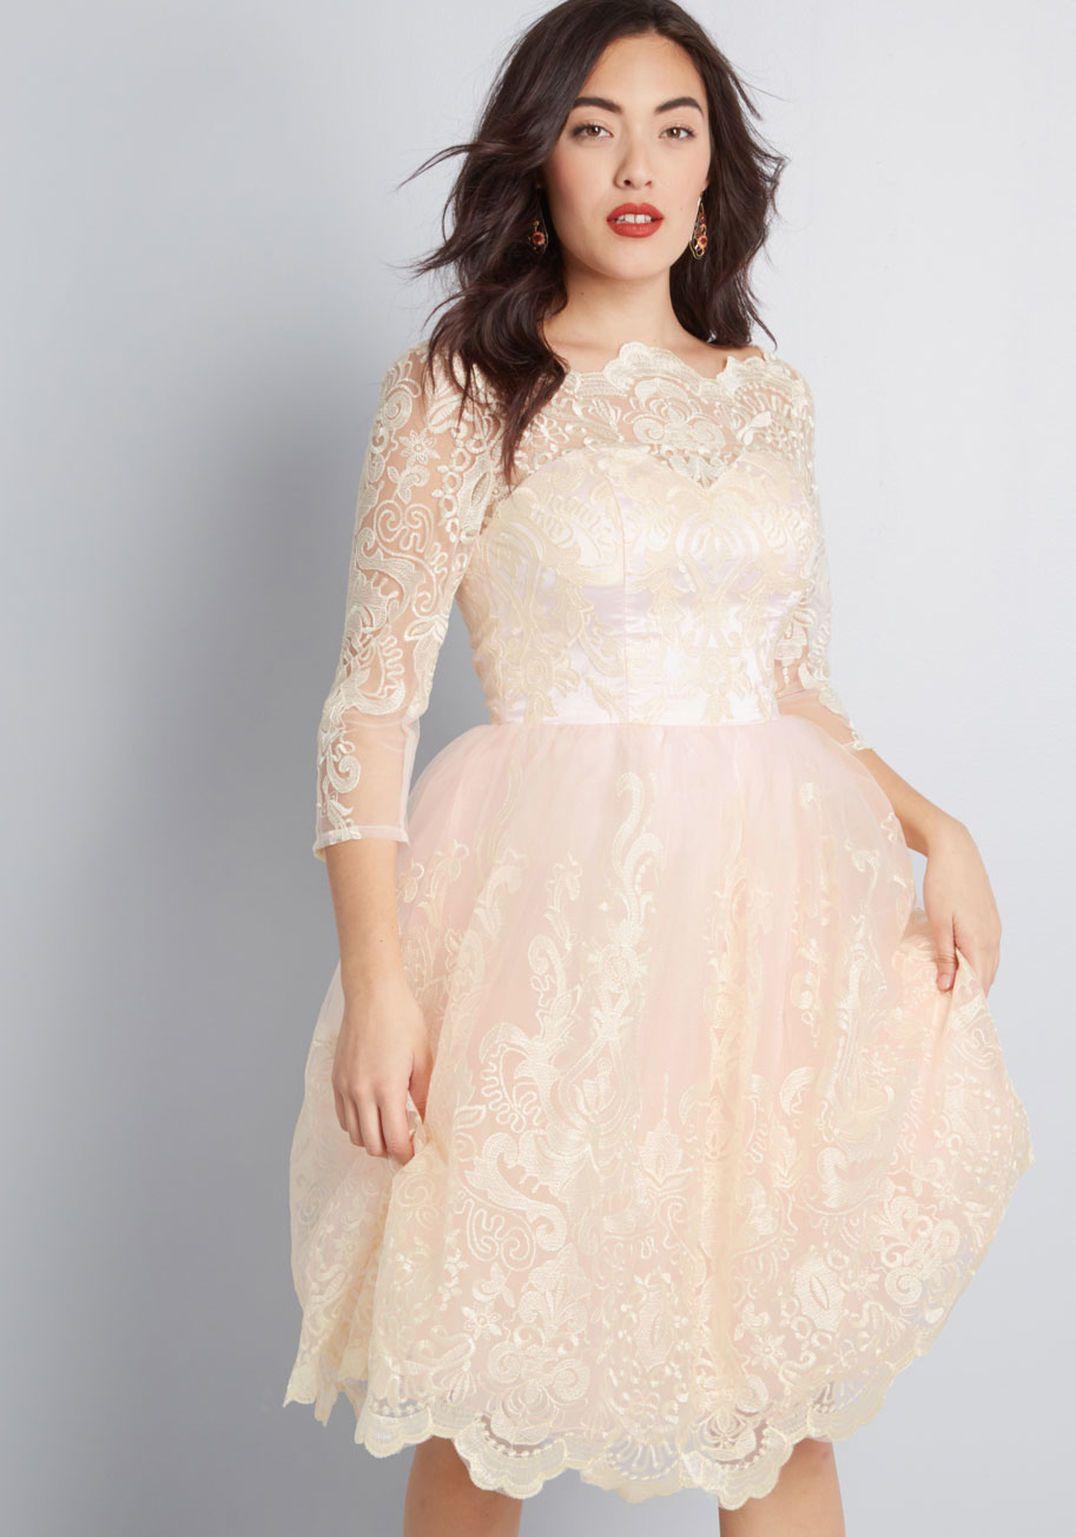 ccc418cf5b31 Chi Chi Chaz Dress – chichiclothing.com   Bridal Wear   Pinterest   Dresses,  Bridesmaid dresses and Prom dresses